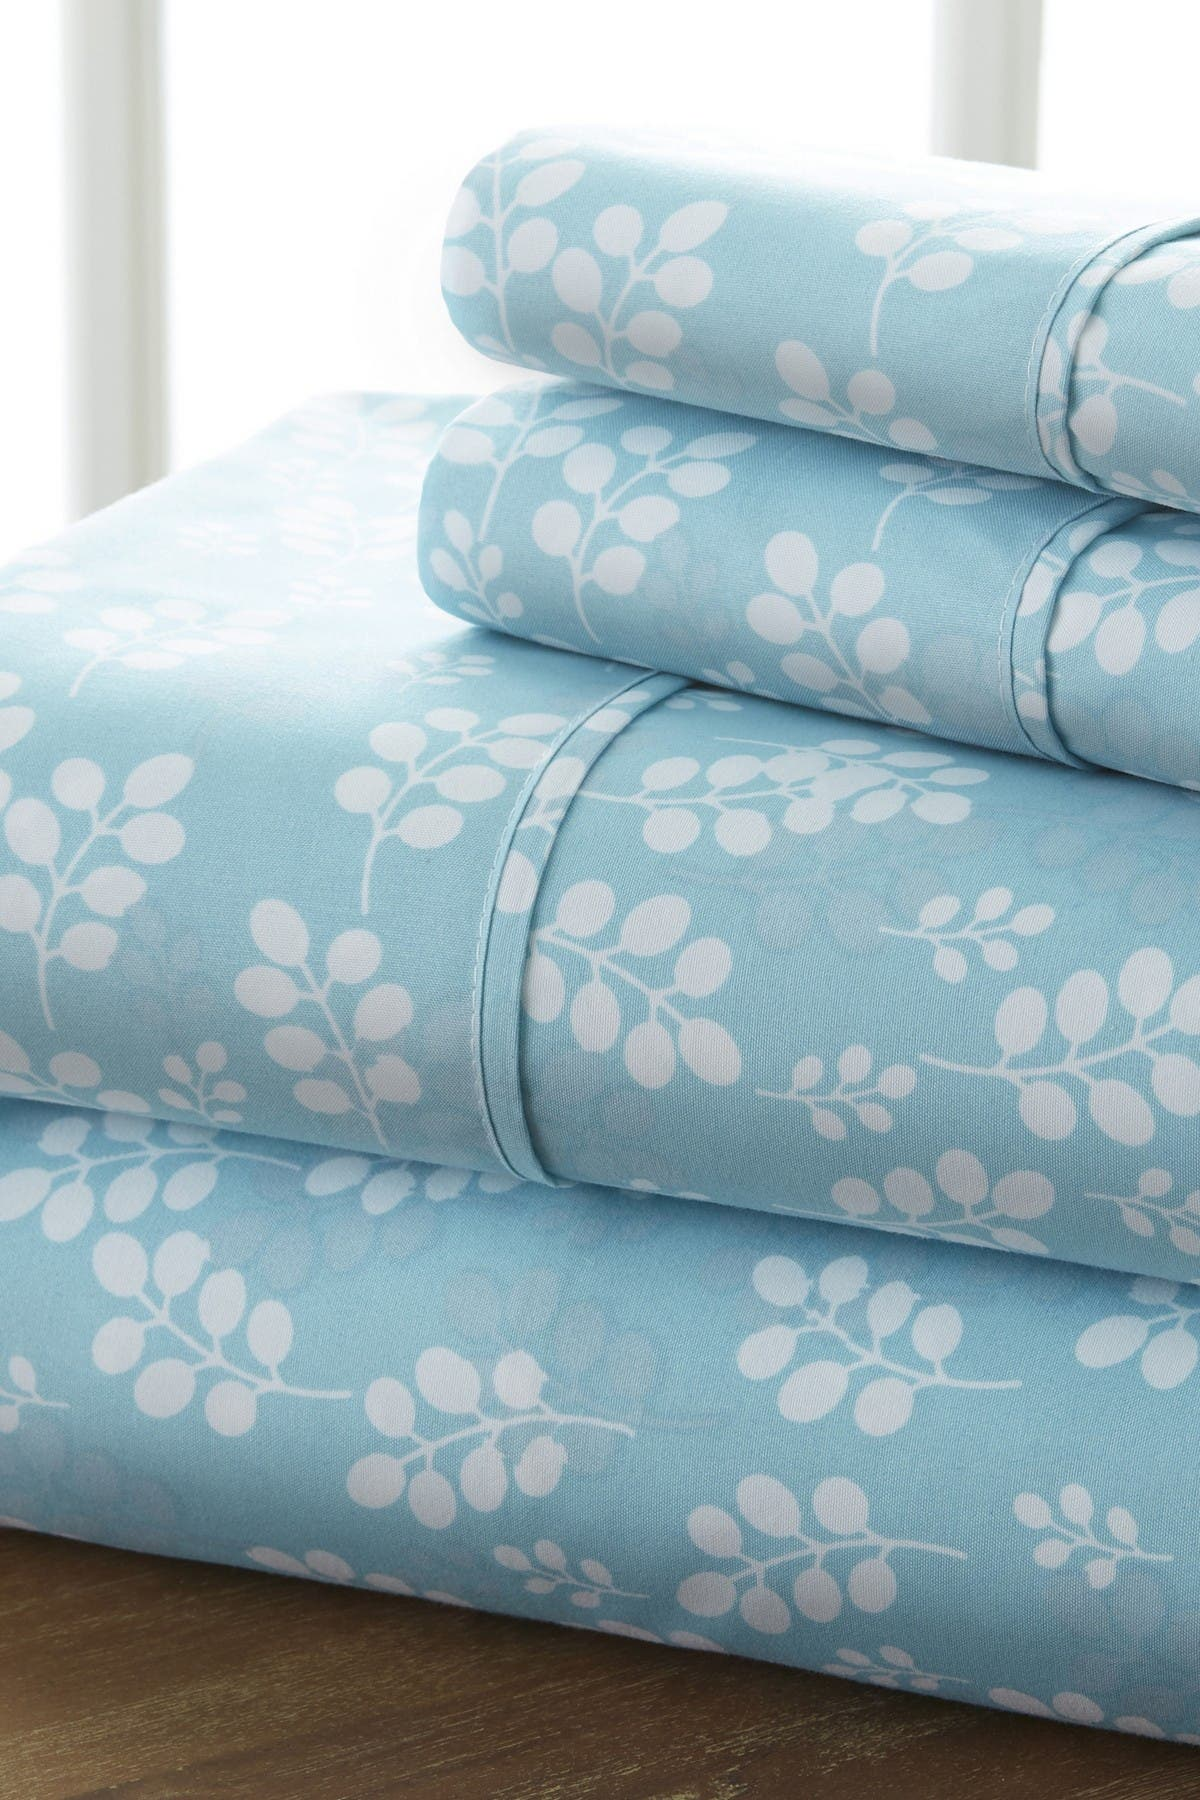 Image of IENJOY HOME Home Spun Premium Ultra Soft Wheat Pattern 4-Piece Full Bed Sheet Set - Pale Blue